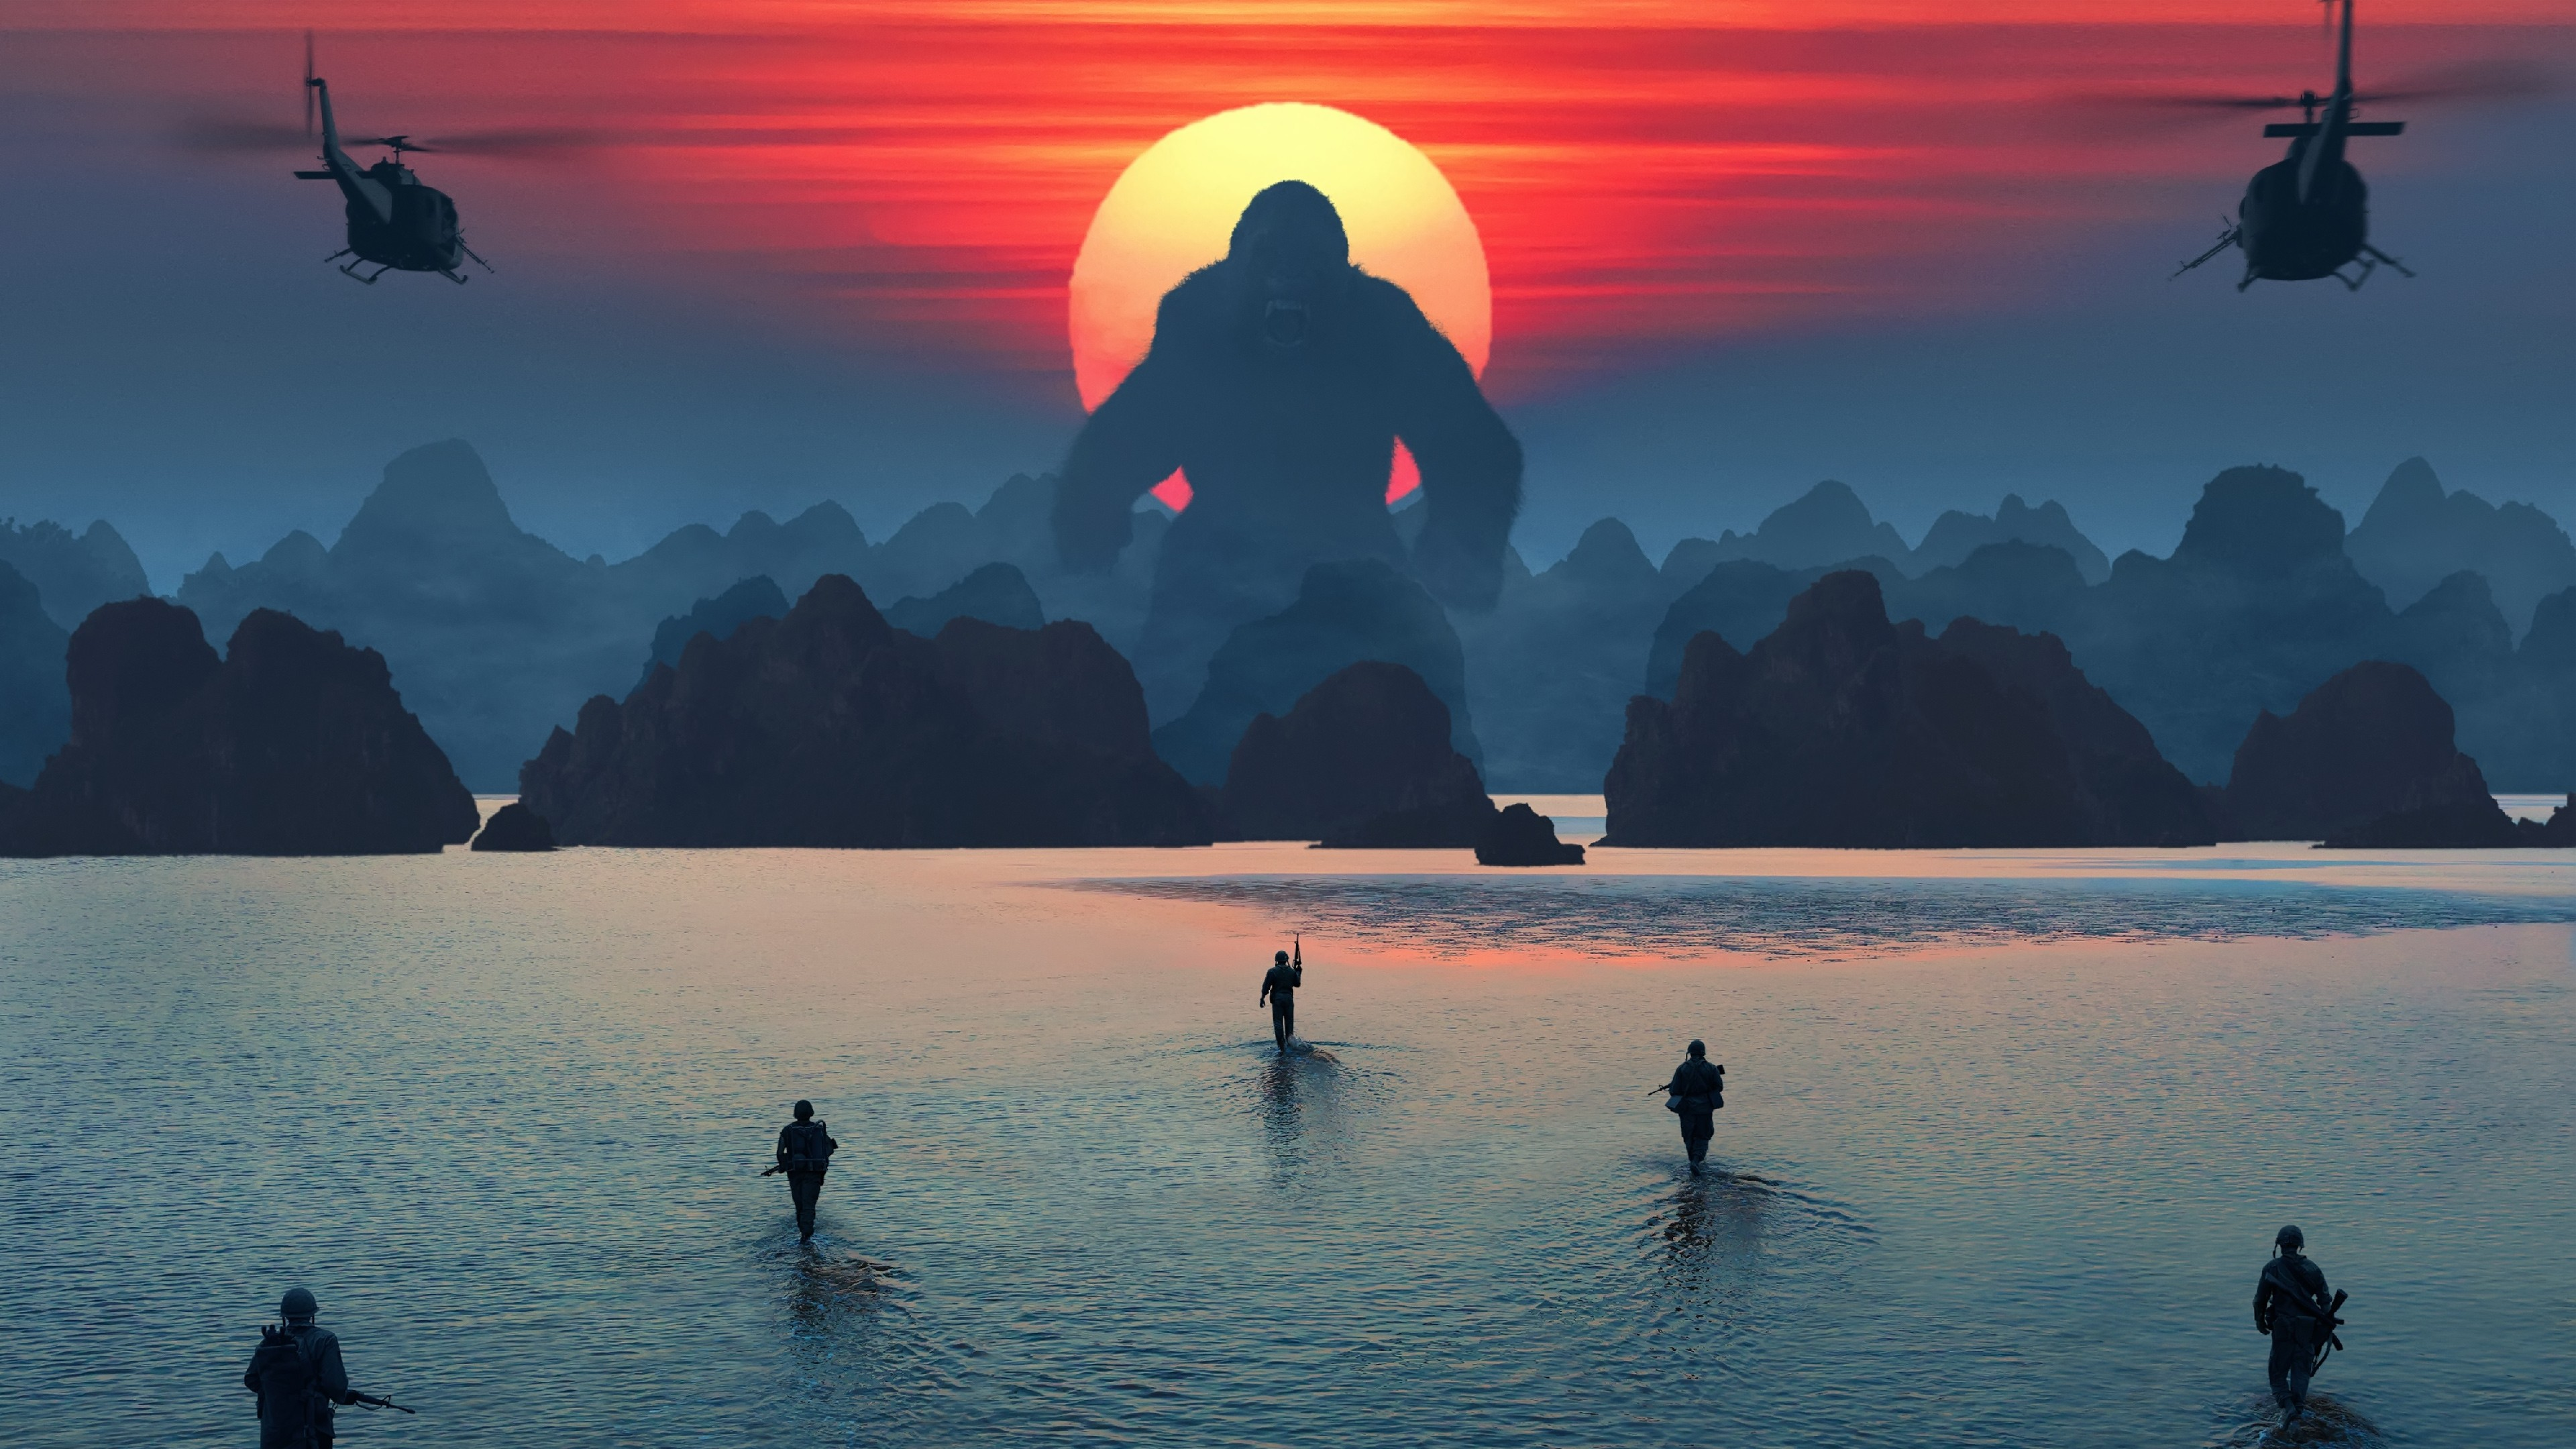 Kong: Skull Island Official Movie Poster